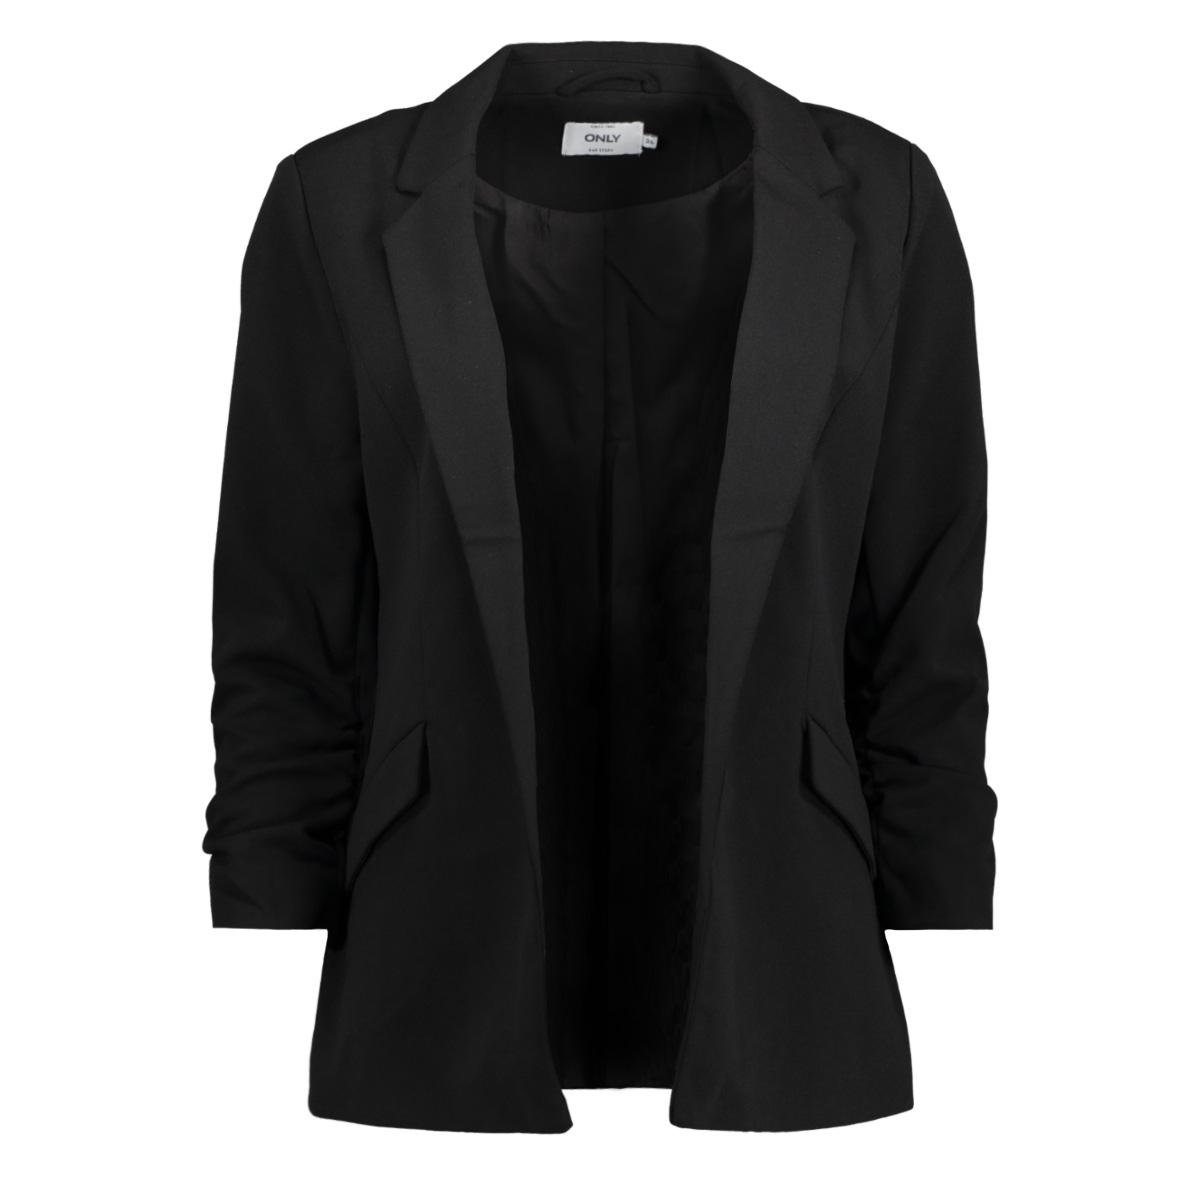 onldiana 3/4 sleeve blazer tlr 15146532 only blazer black